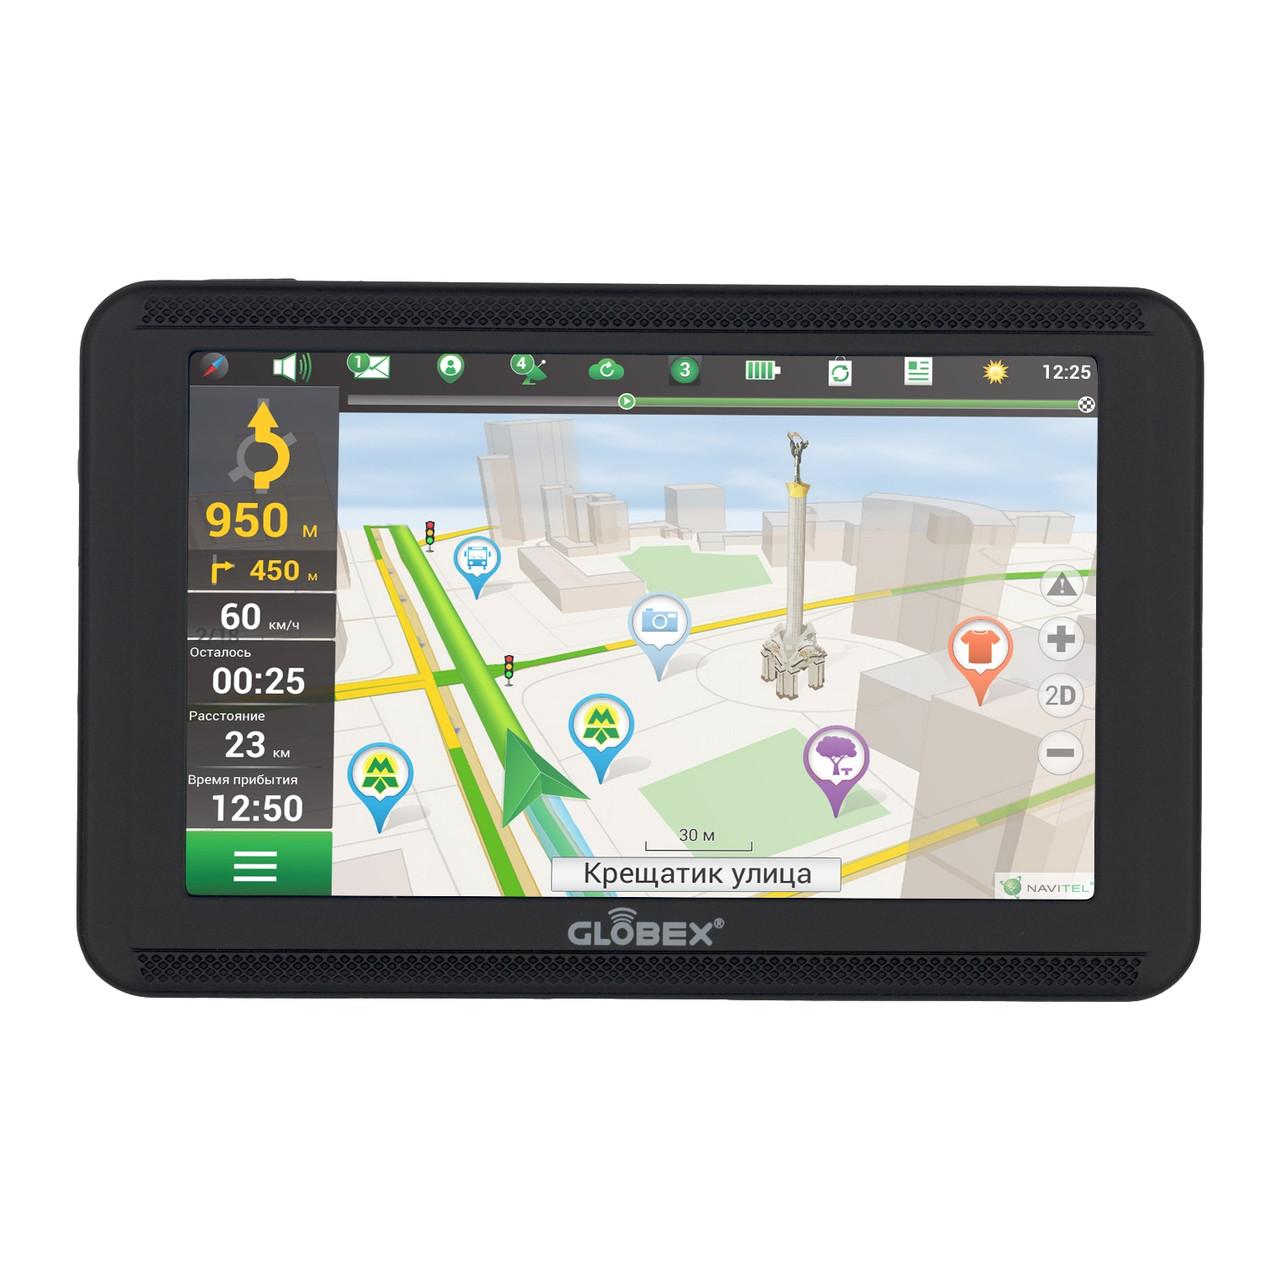 GPS навигатор Globex GE520 IGO для грузовиков Black (glo_10520)Нет в наличии